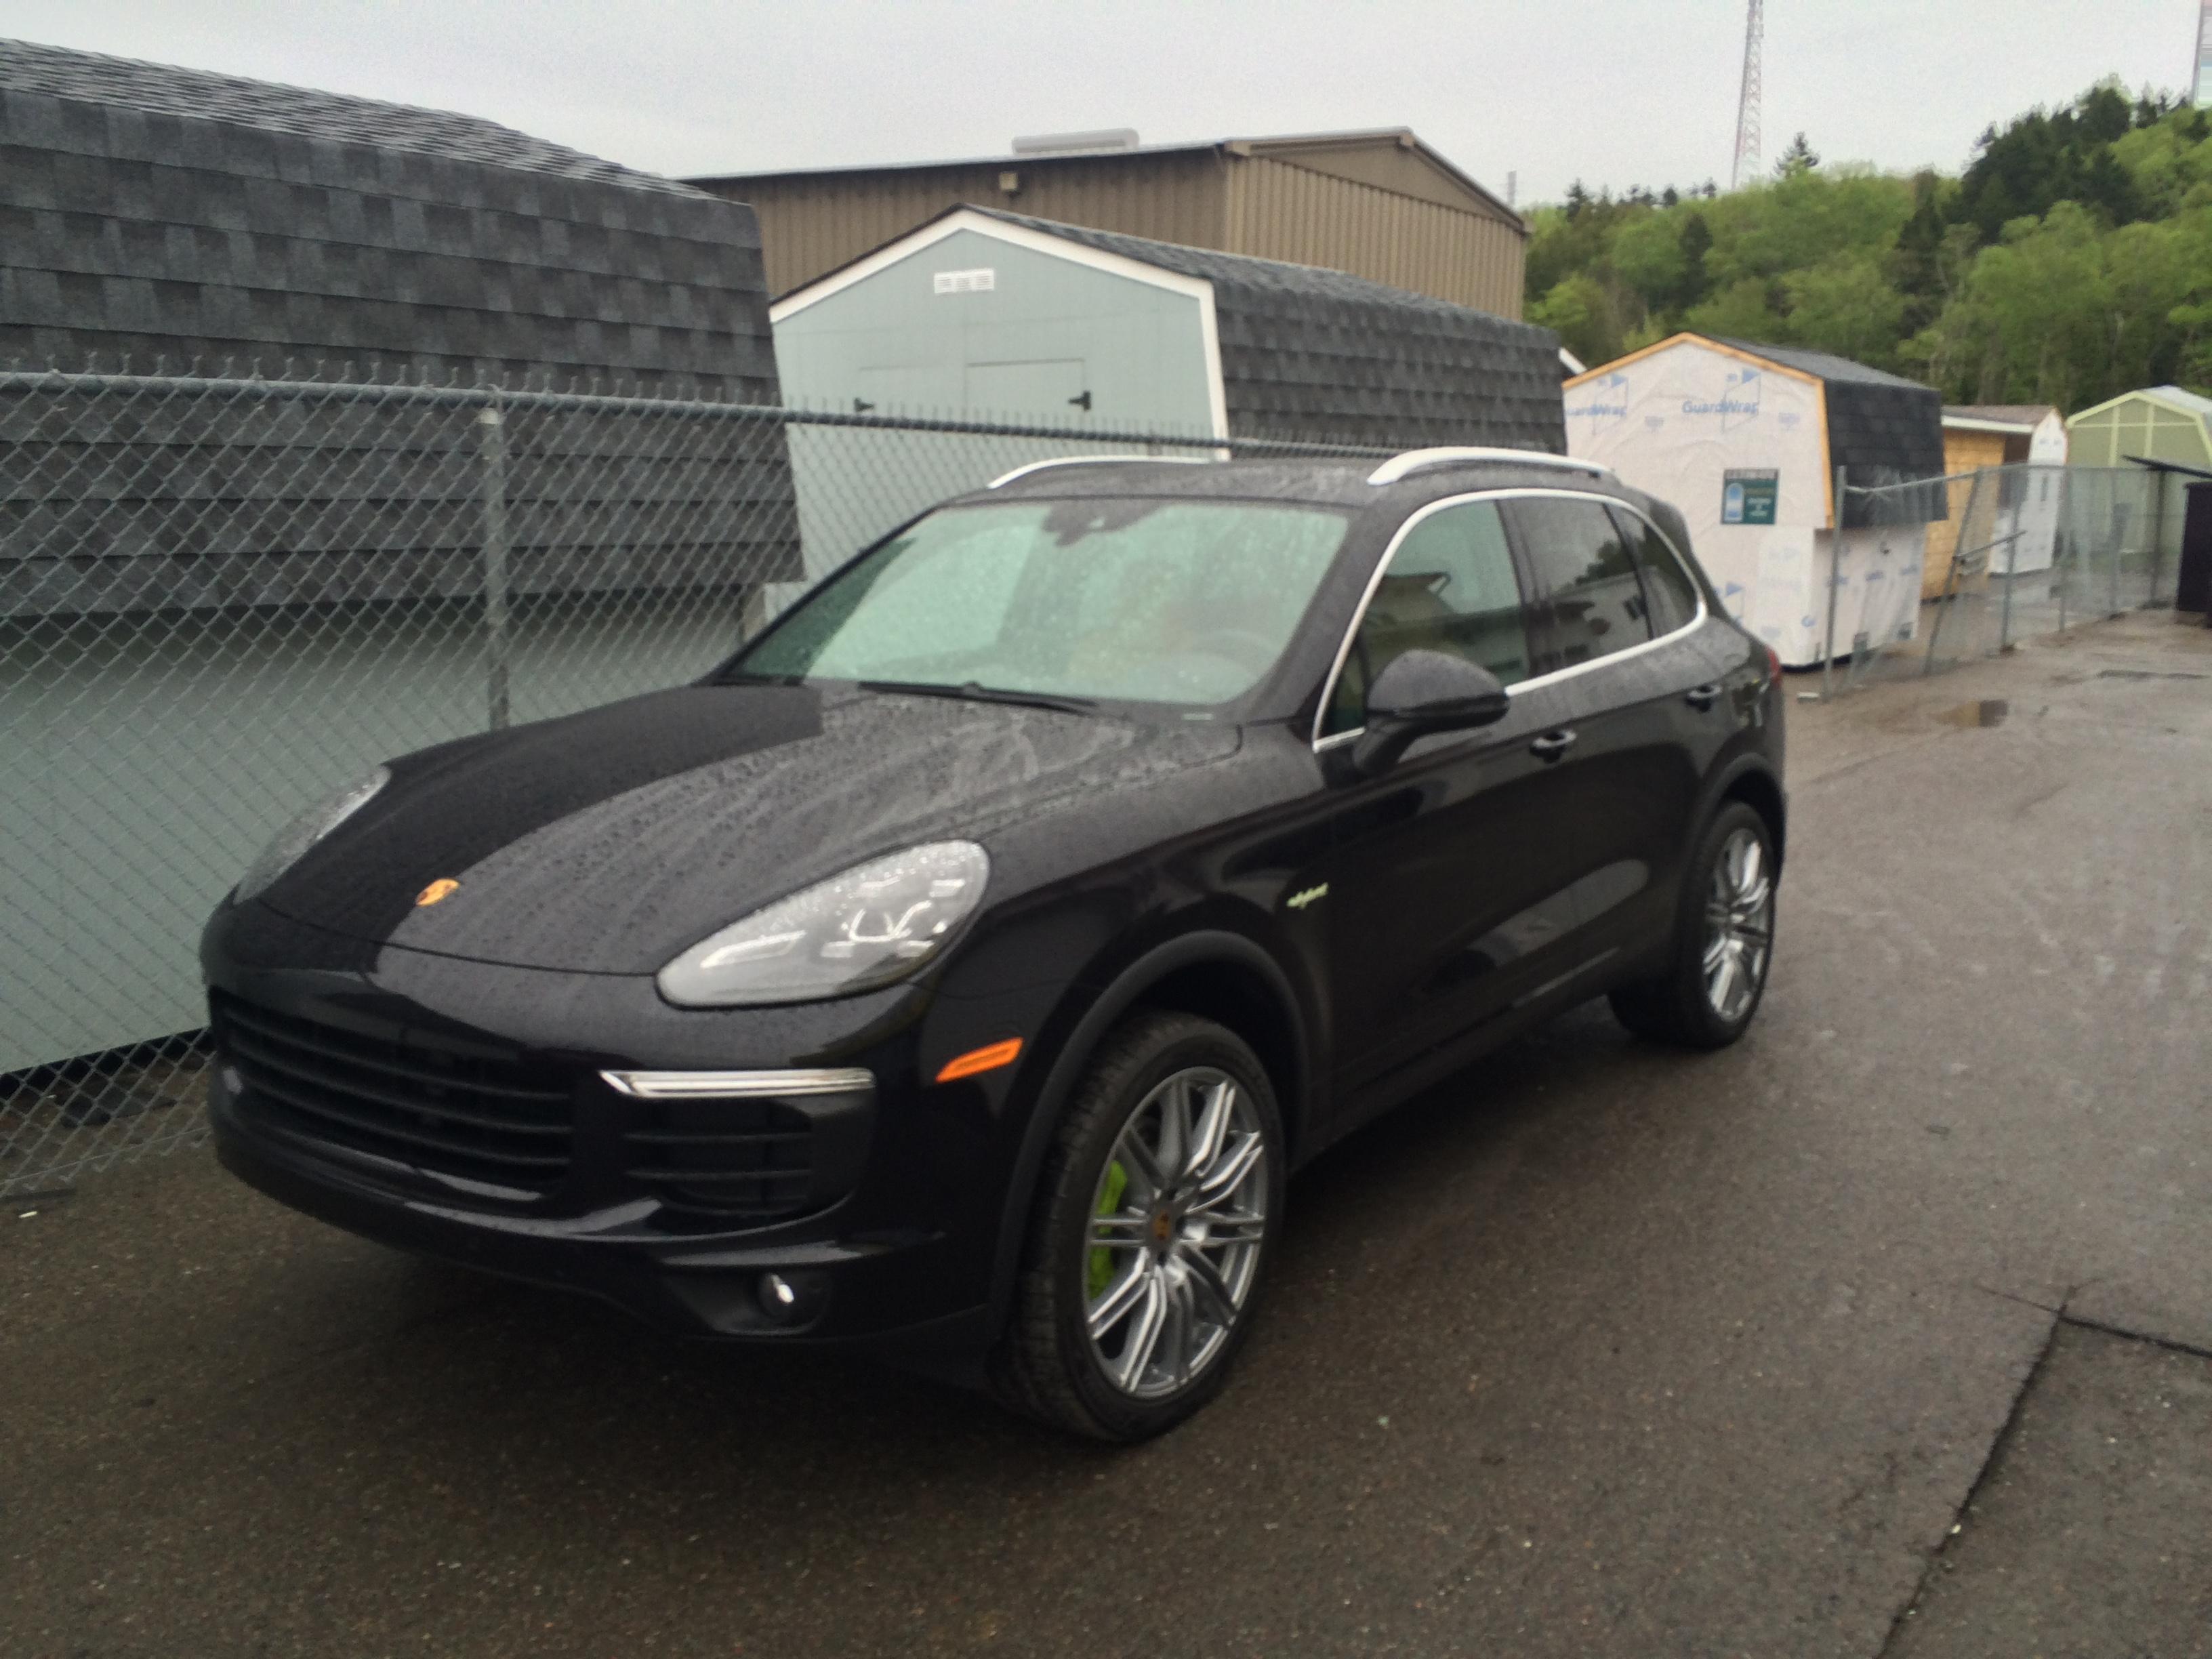 Used 2015 Porsche Cayenne S E Hybrid For Sale In Saint